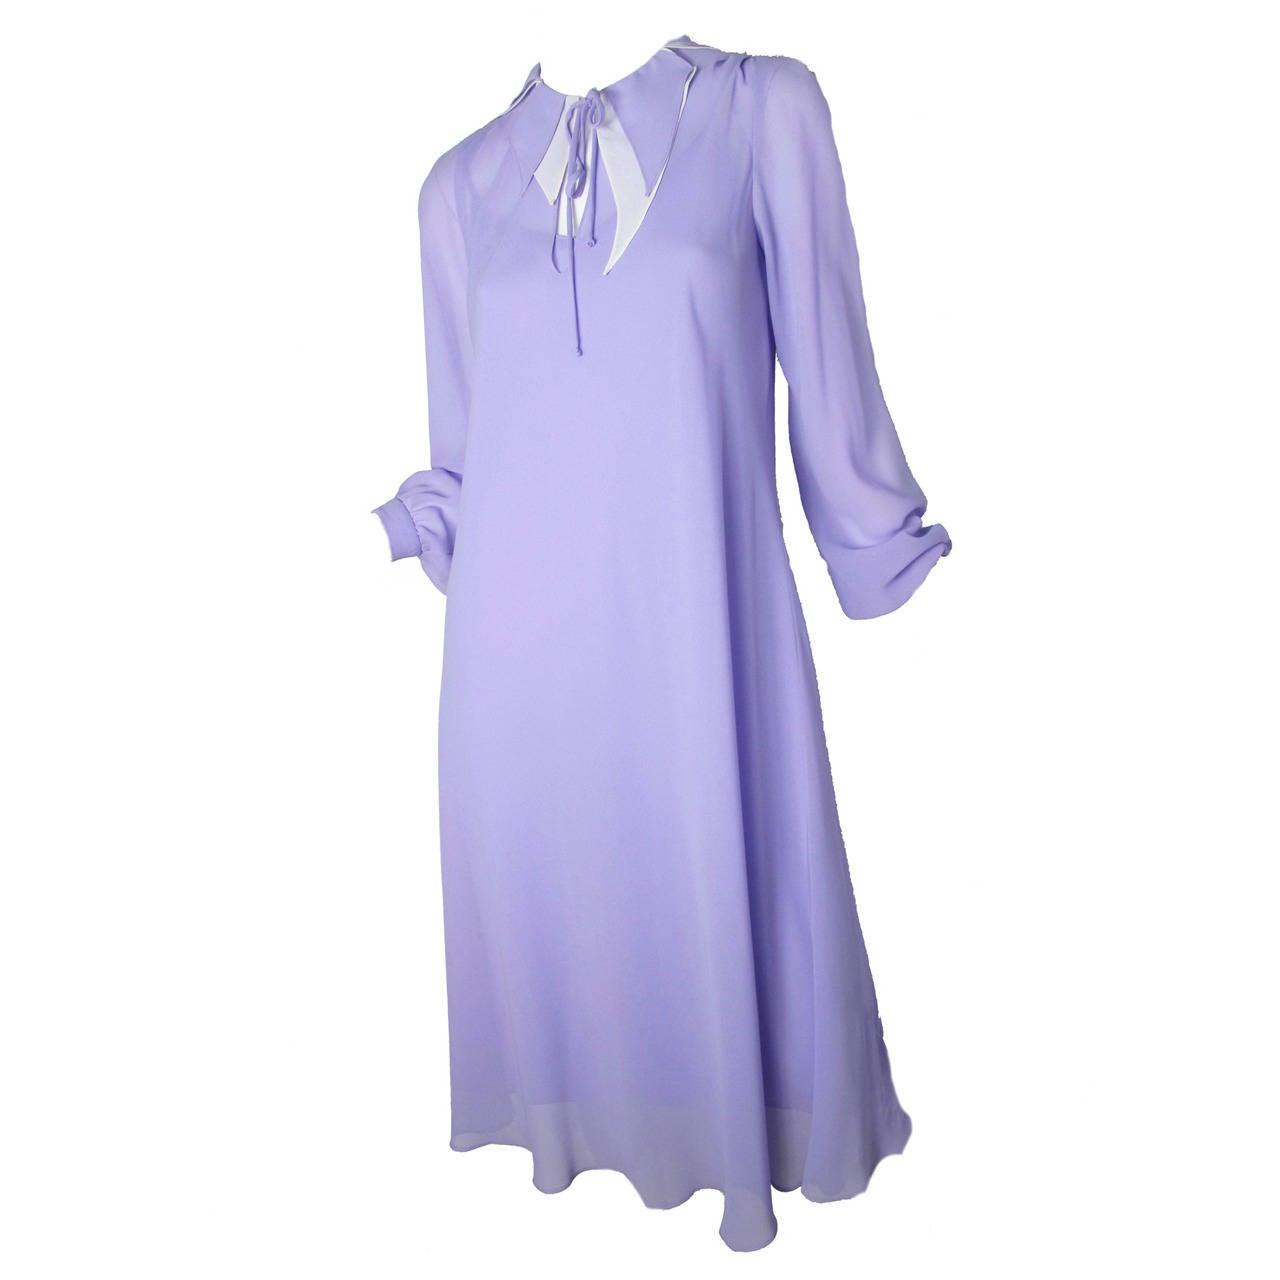 Sant' Angelo Petal Dress For Sale